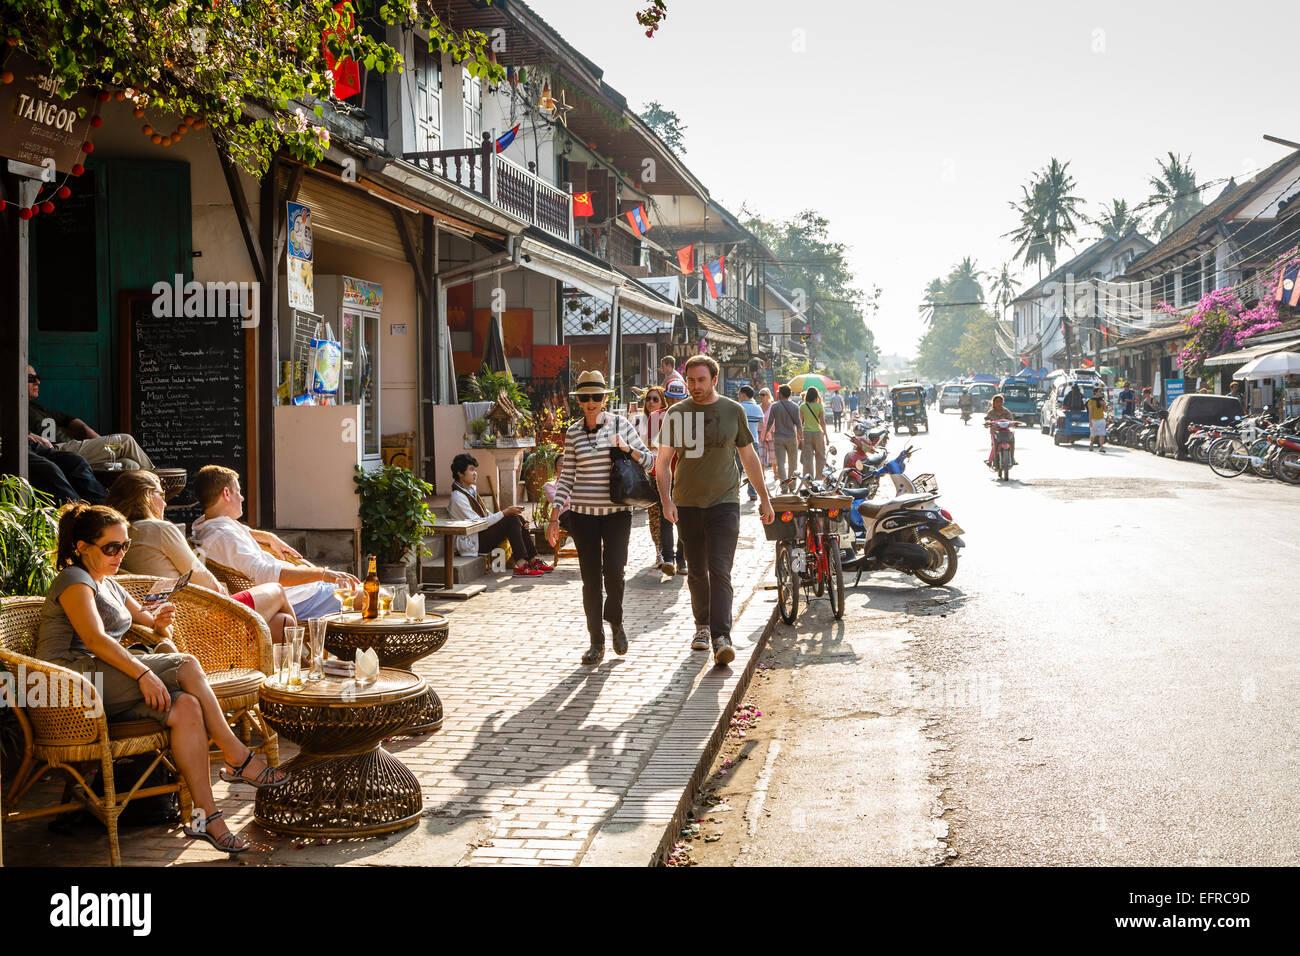 Shops and restaurants on the main street, Sisavangvong Road, Luang Prabang, Laos. - Stock Image